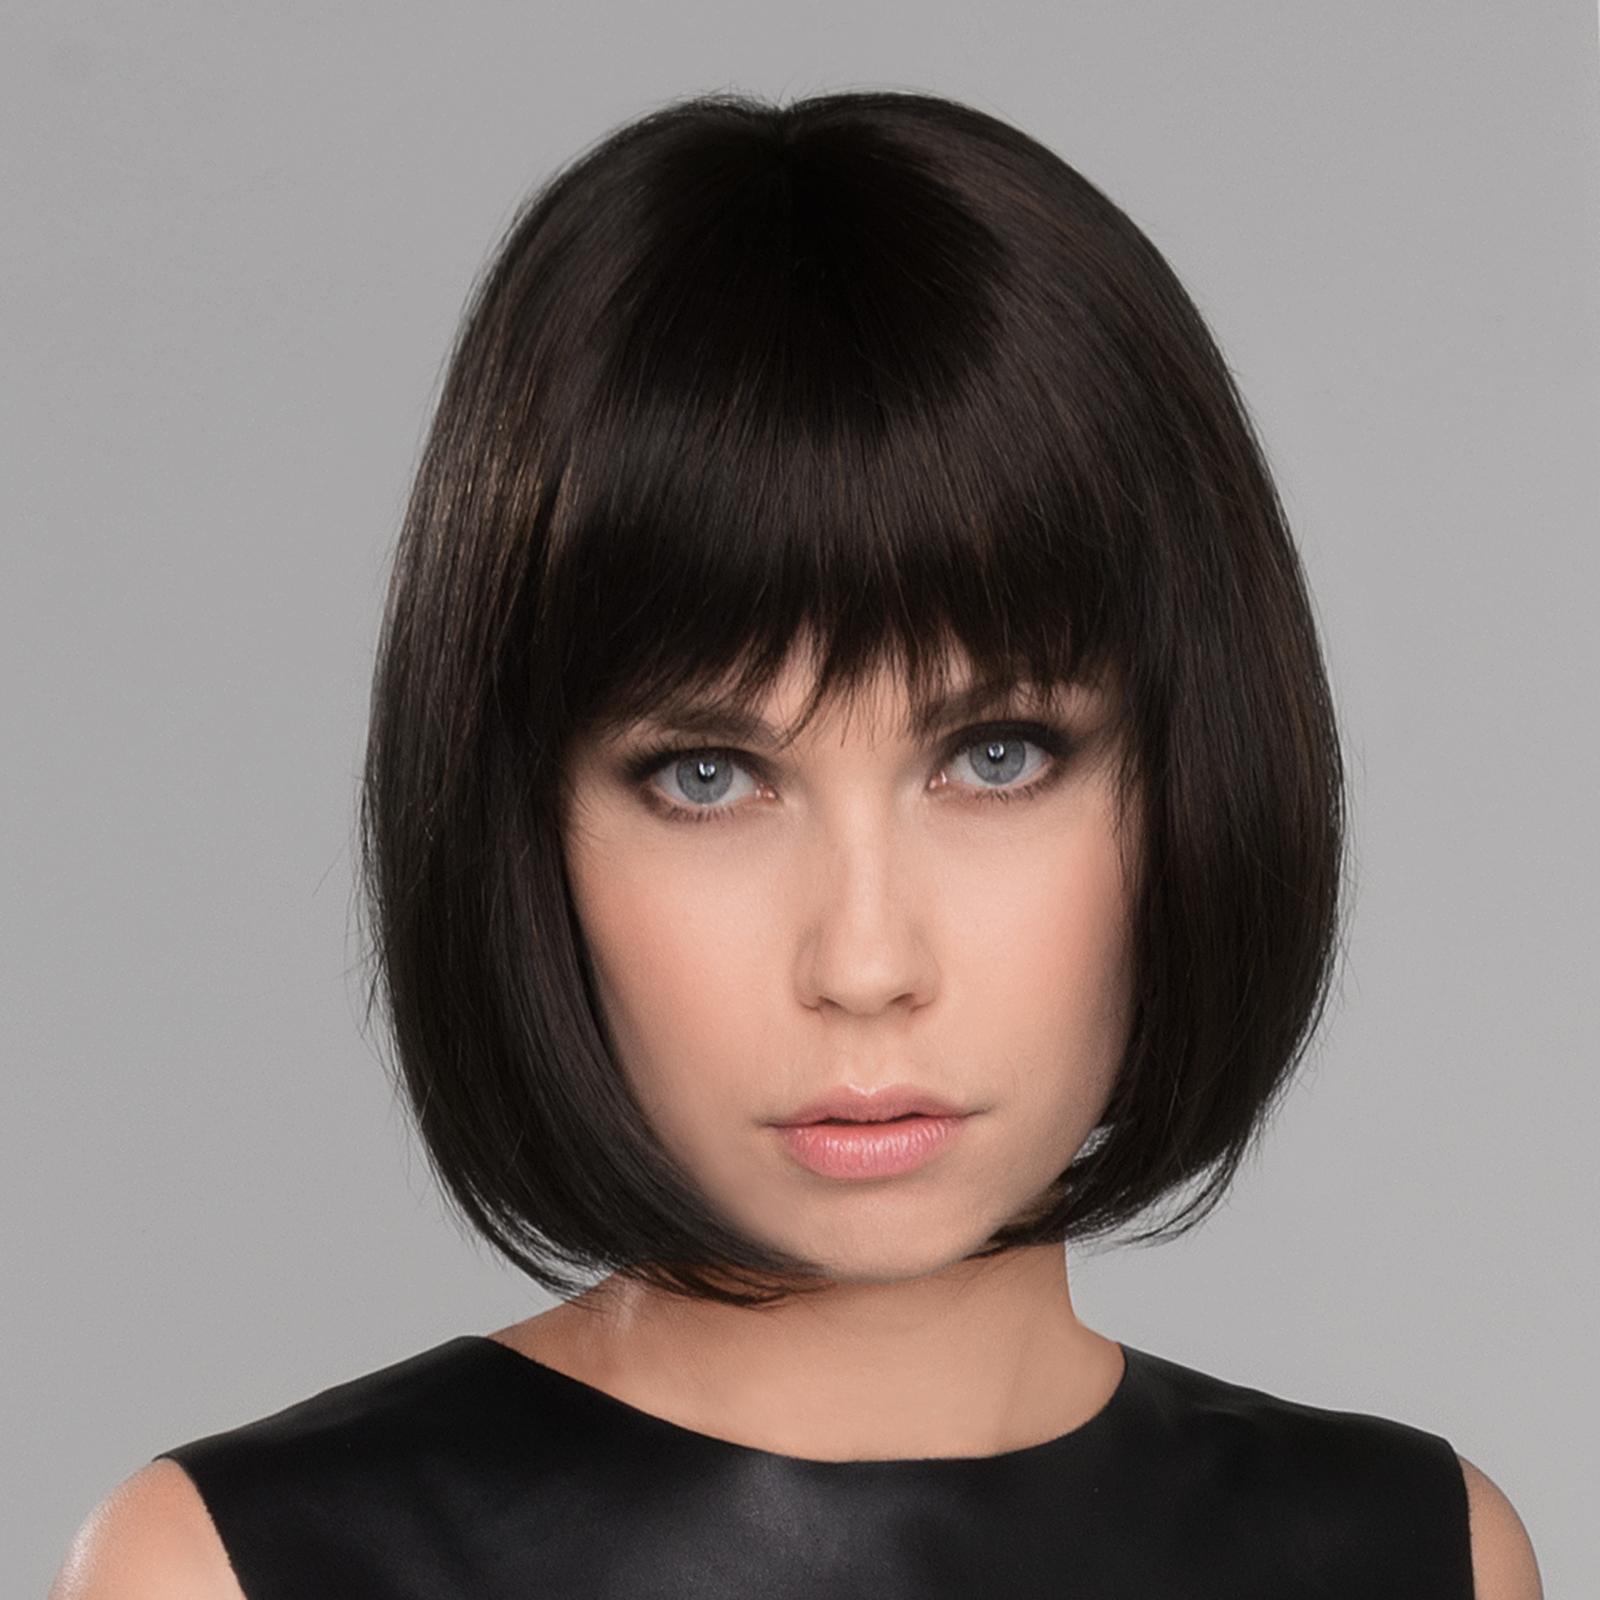 Paruka Sue mono     ++ Hairpower - Aloena.cz - Paruky Ostrava 786aaba151